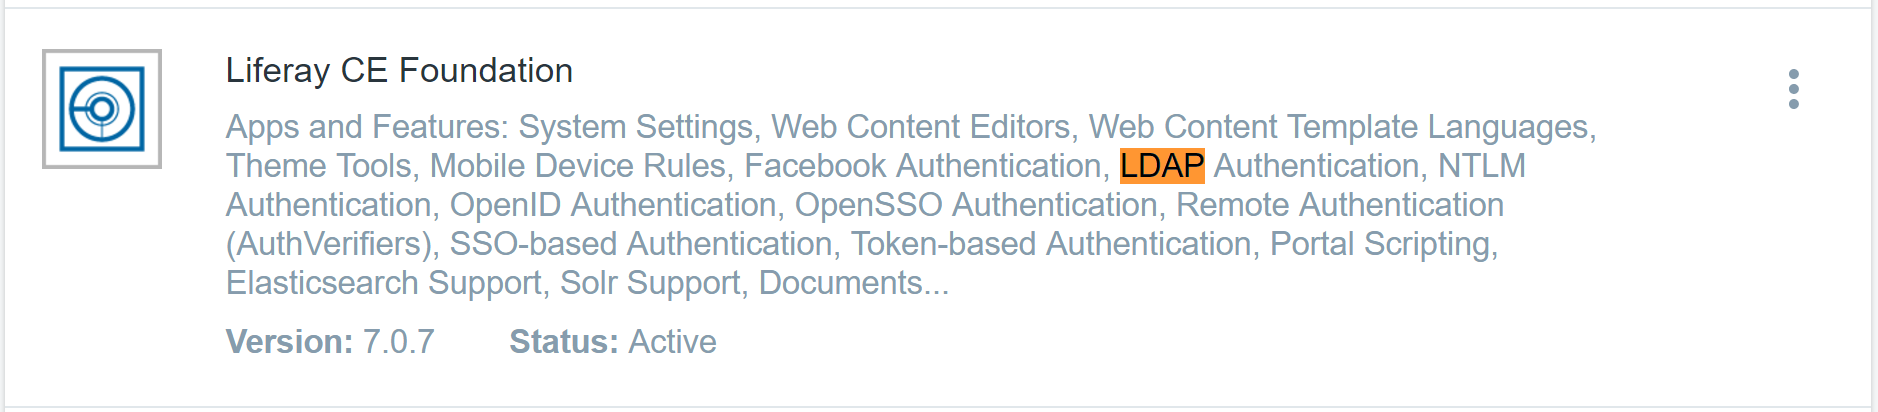 Figure 1: The Liferay Foundation app suite contains the LDAP Authentication application.